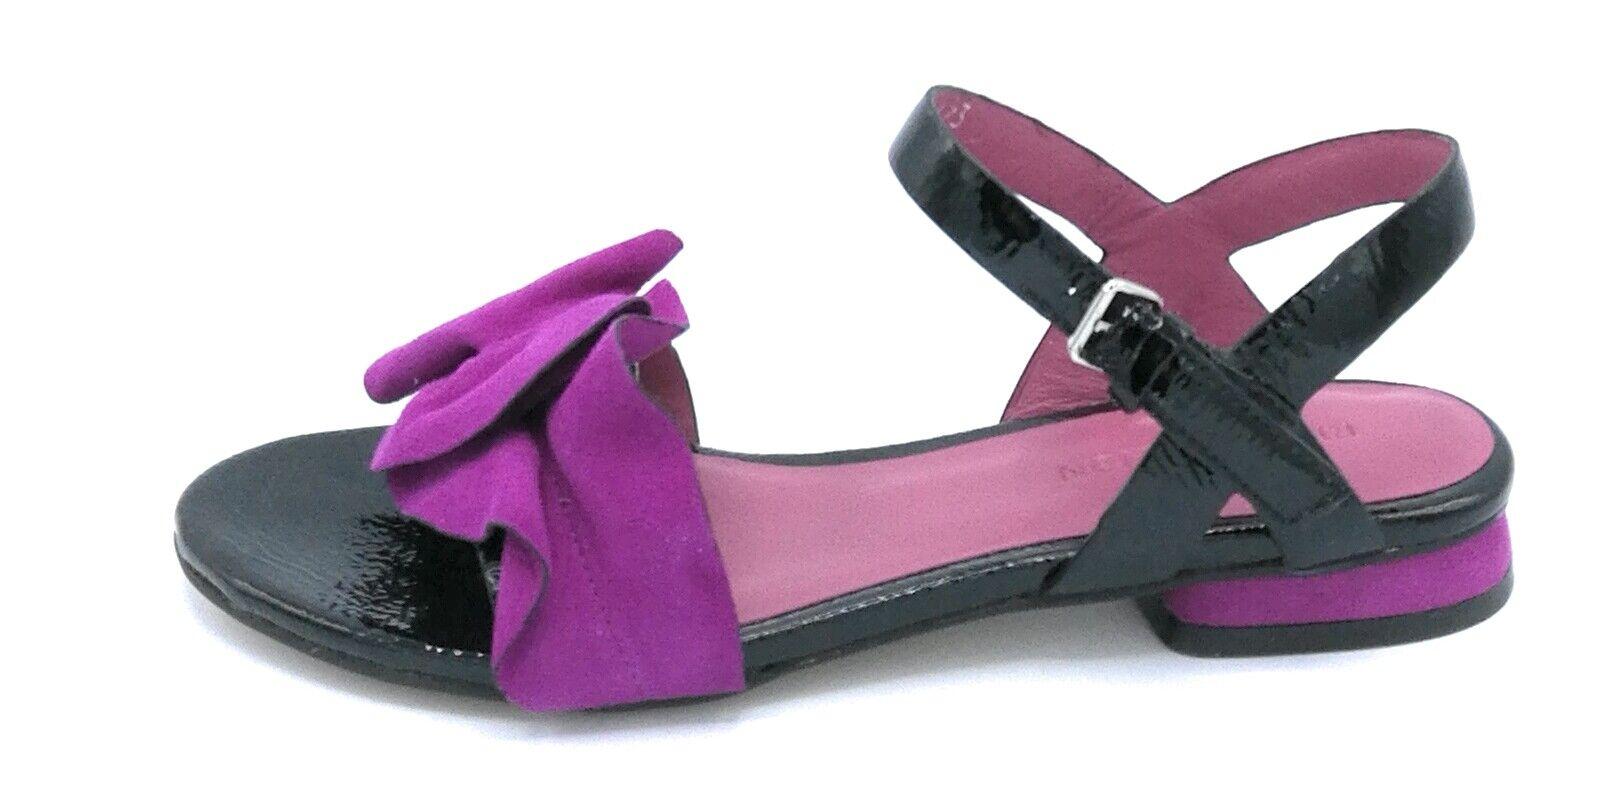 Zanon J5903 sandal naplak-suede black purple strap frappa